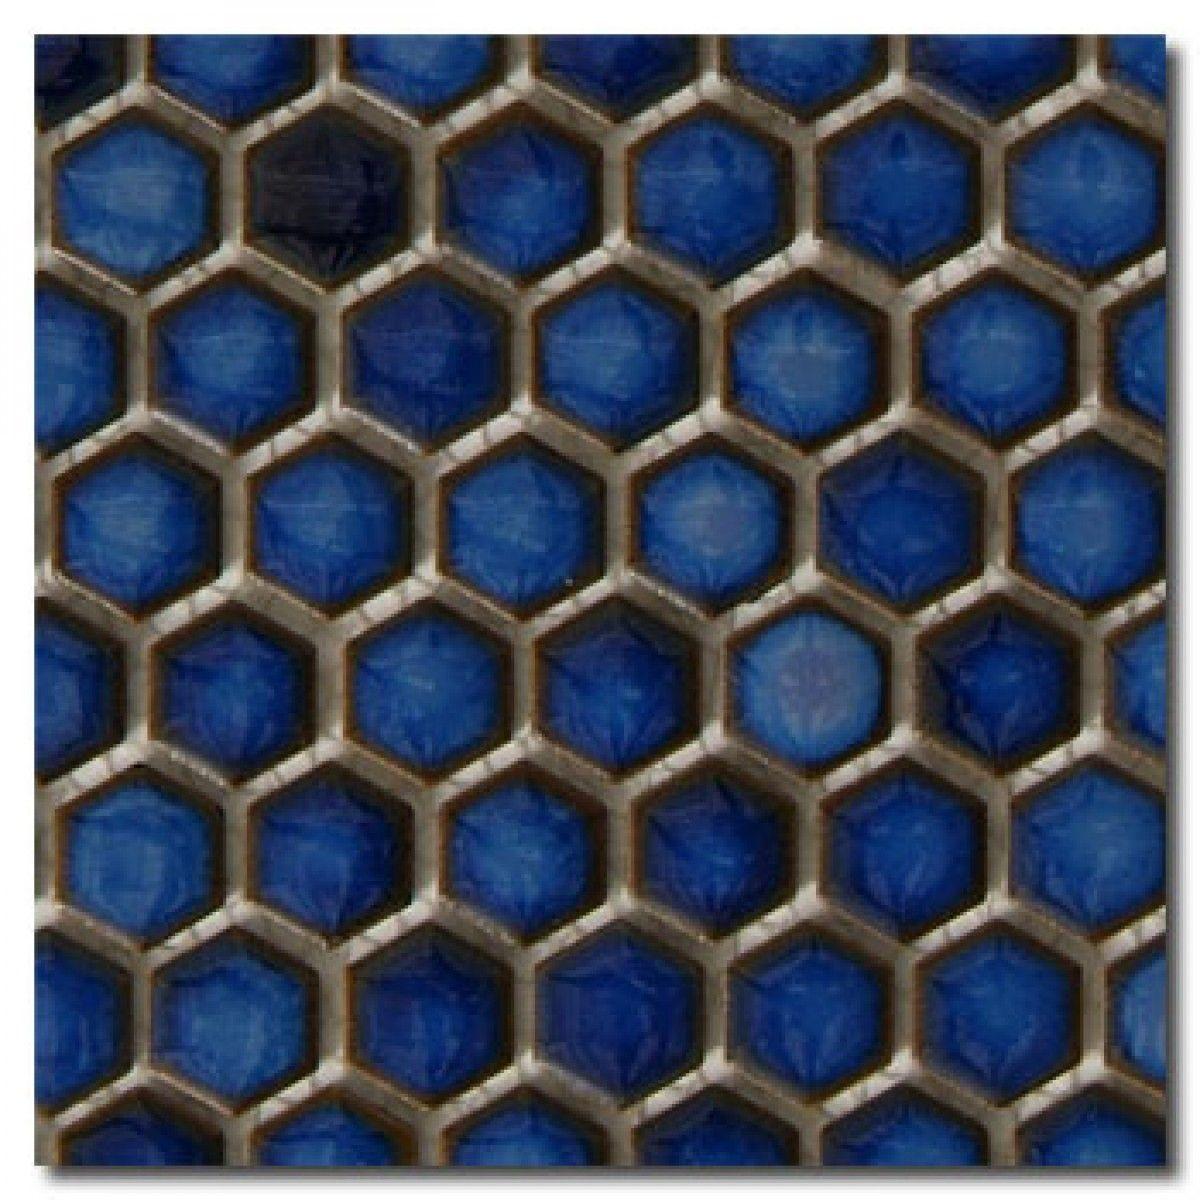 Beltile Hexagon Porcelain Mosaic Tiles Tile and Stone including ...